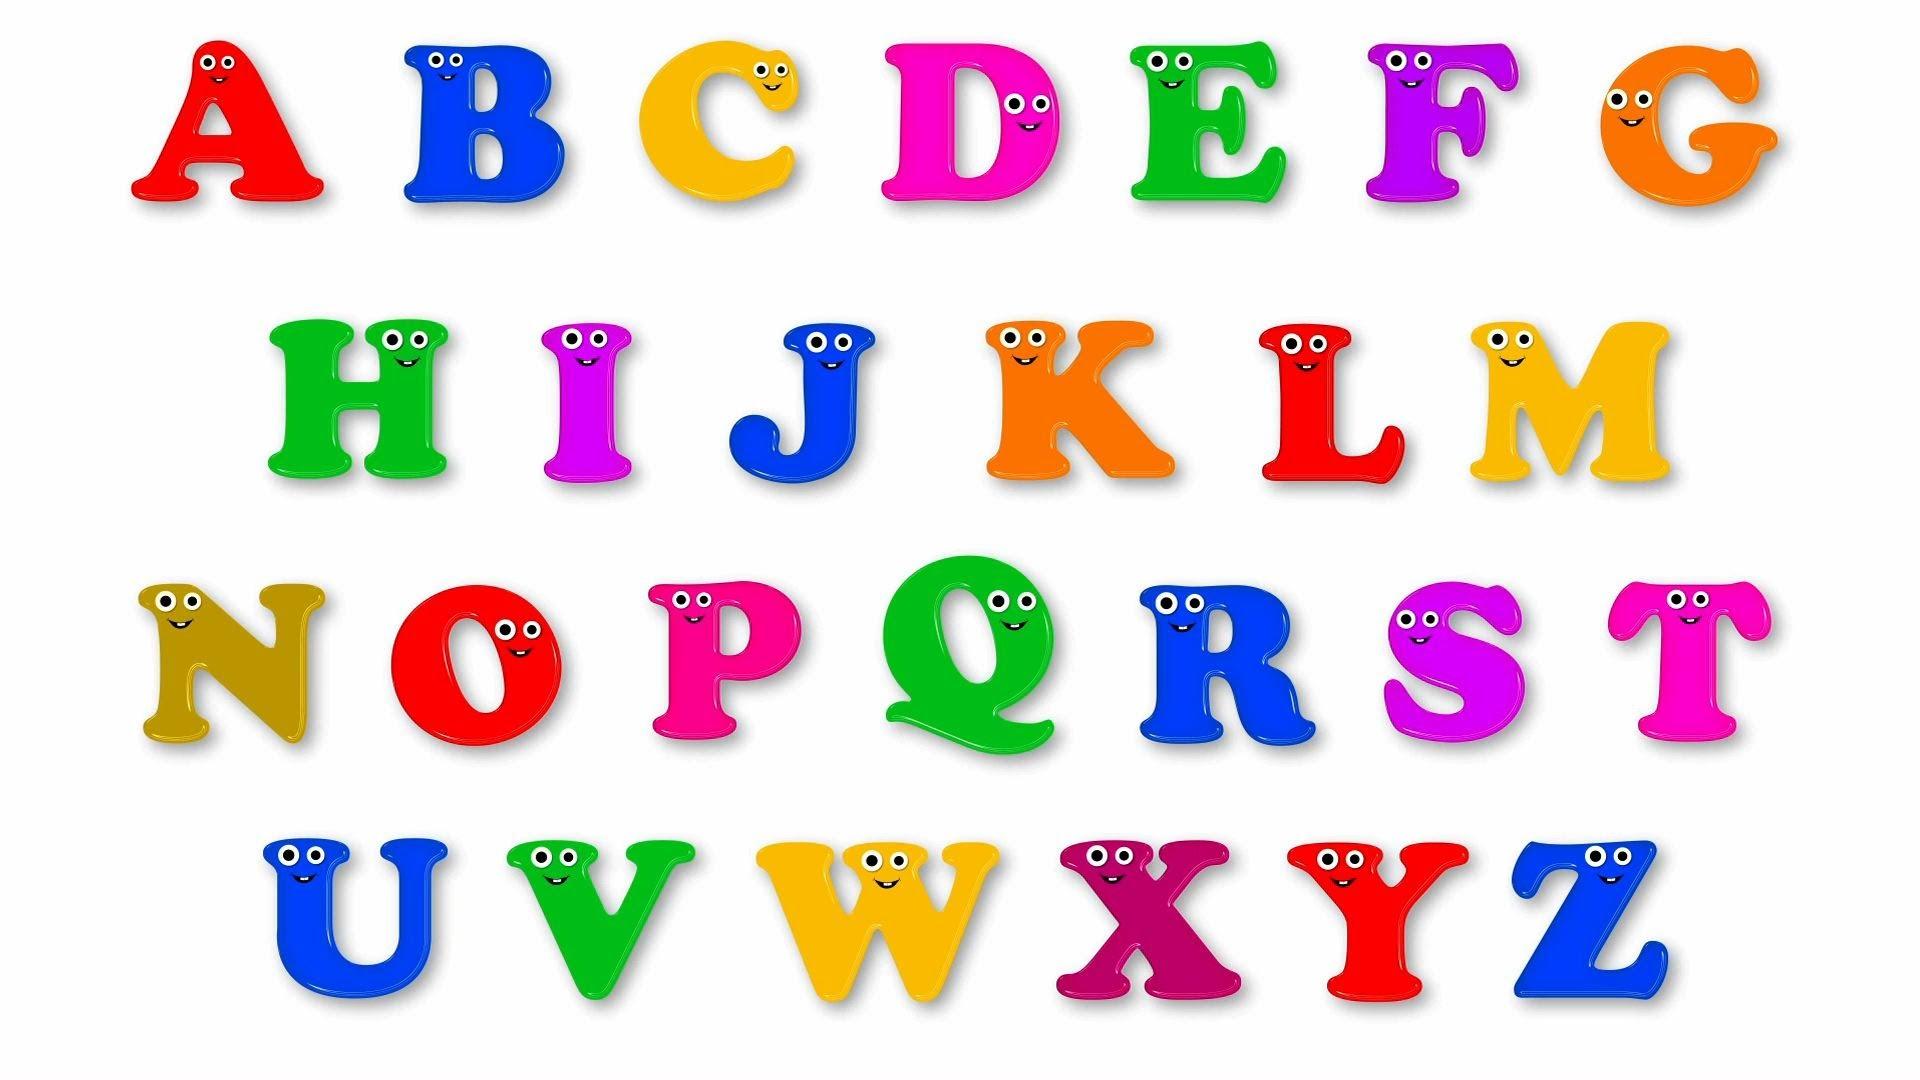 Знакомимся с английским алфавитом — легко и интересно!